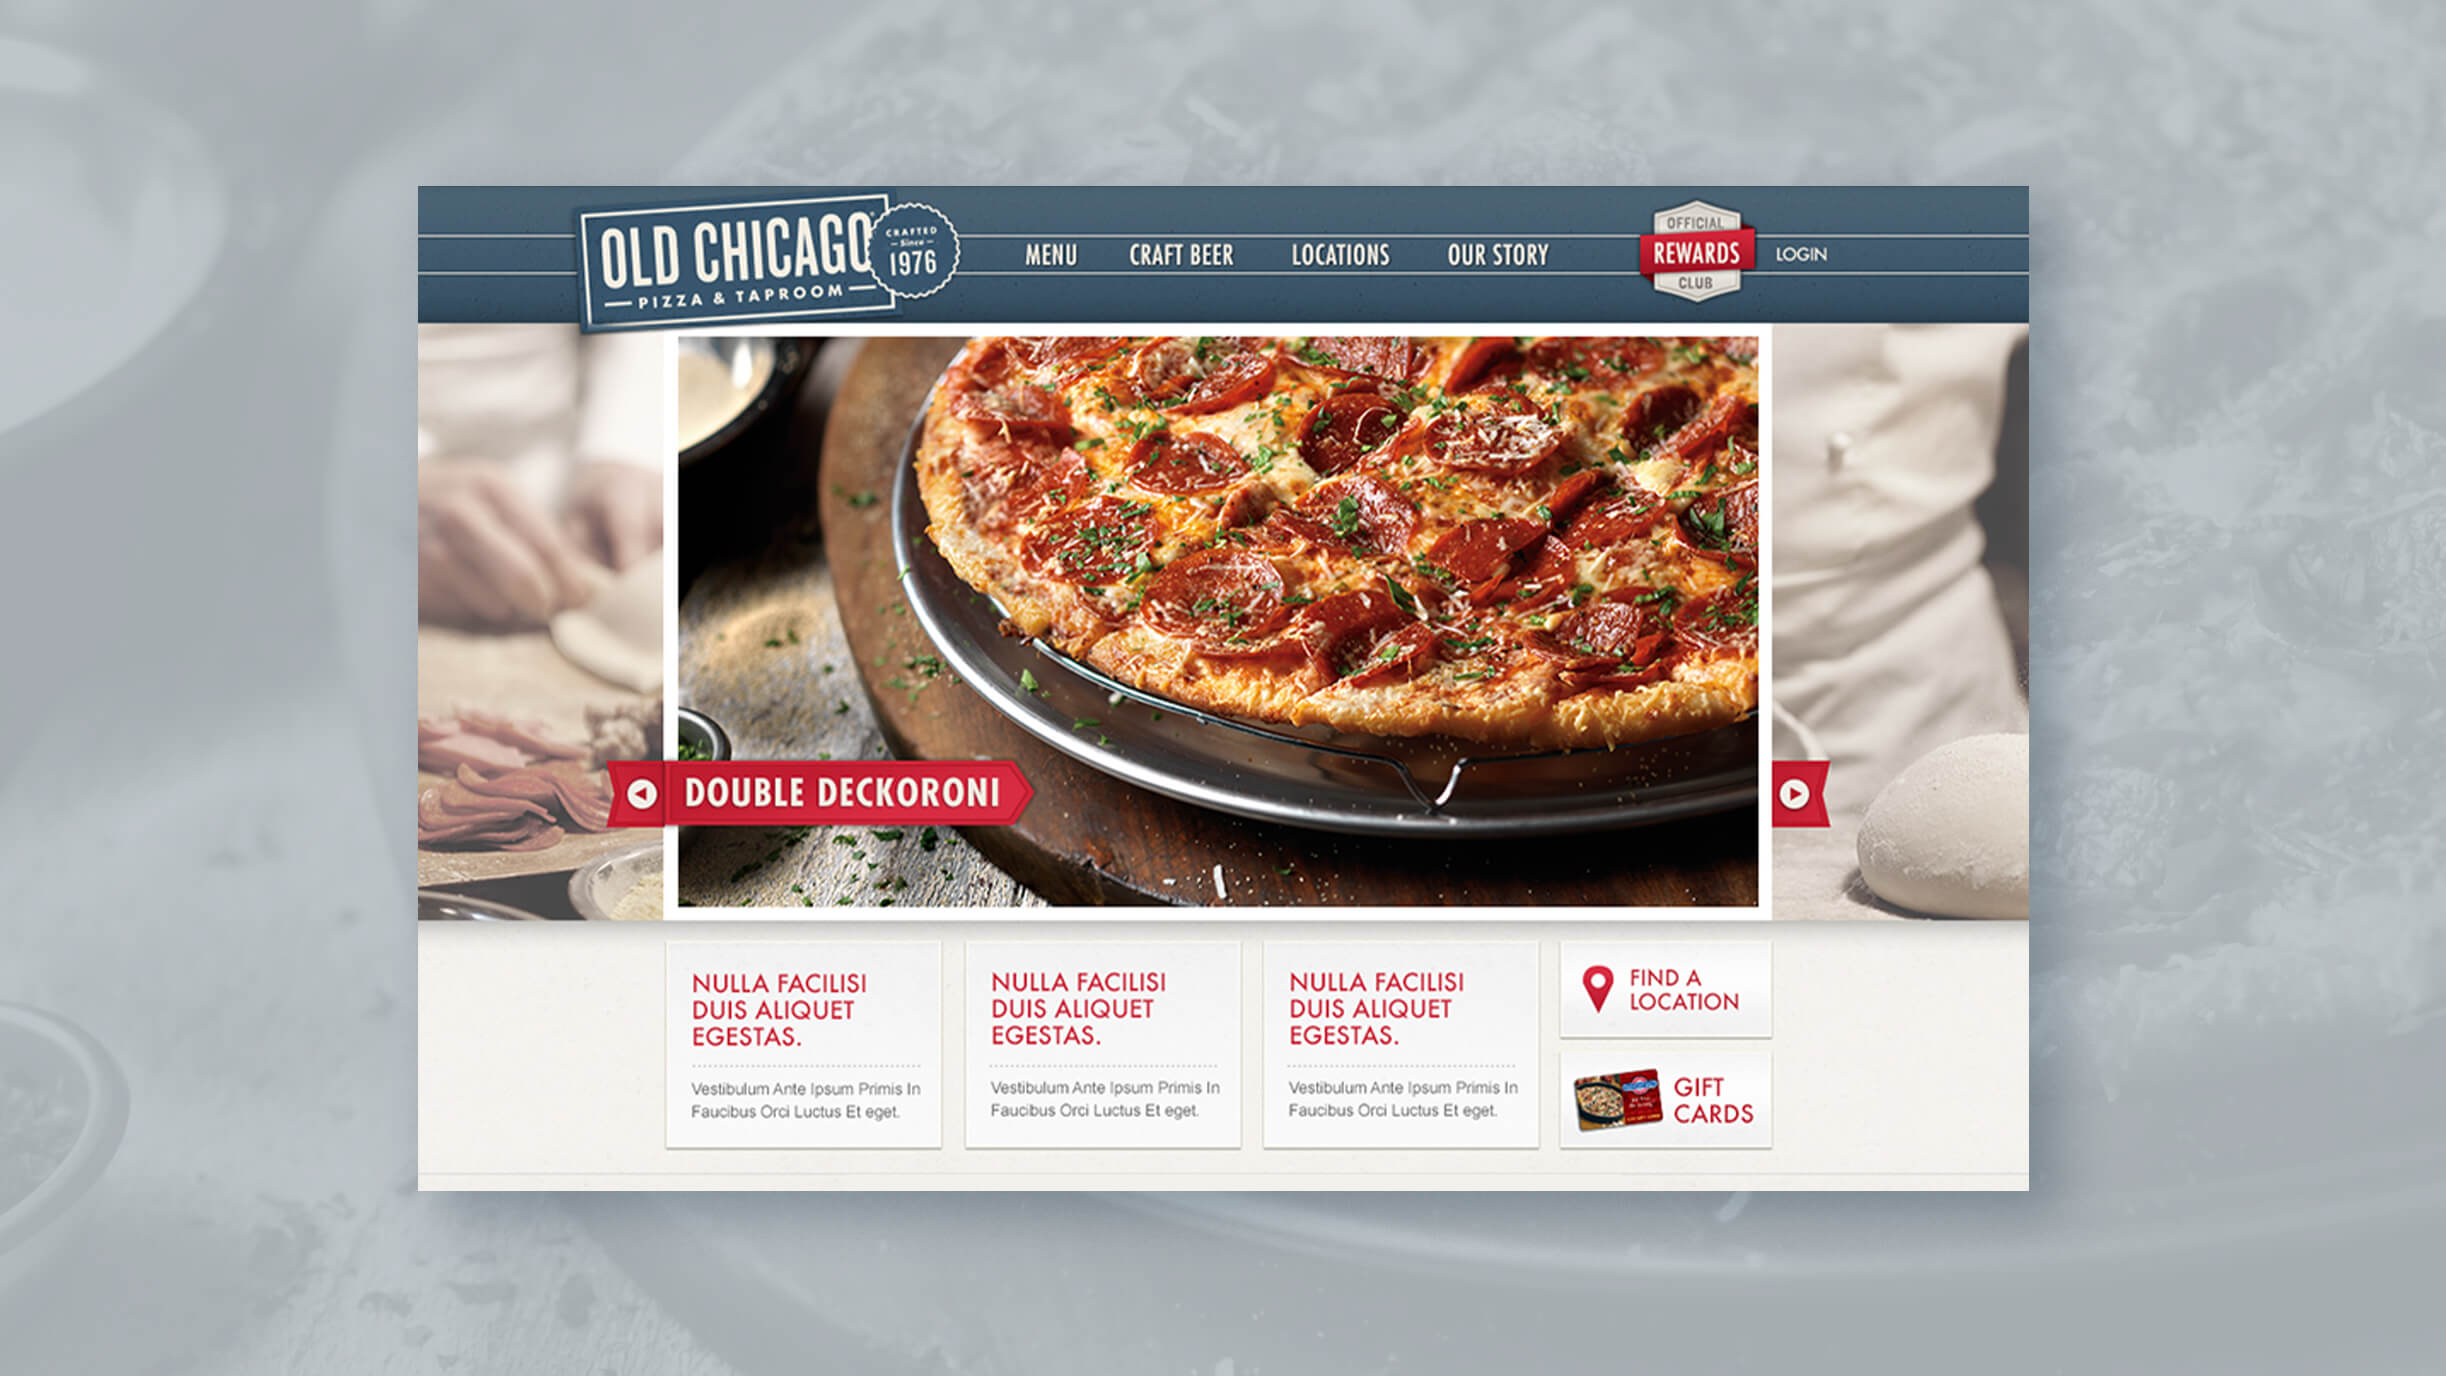 old-chicago-website-desktop.jpg